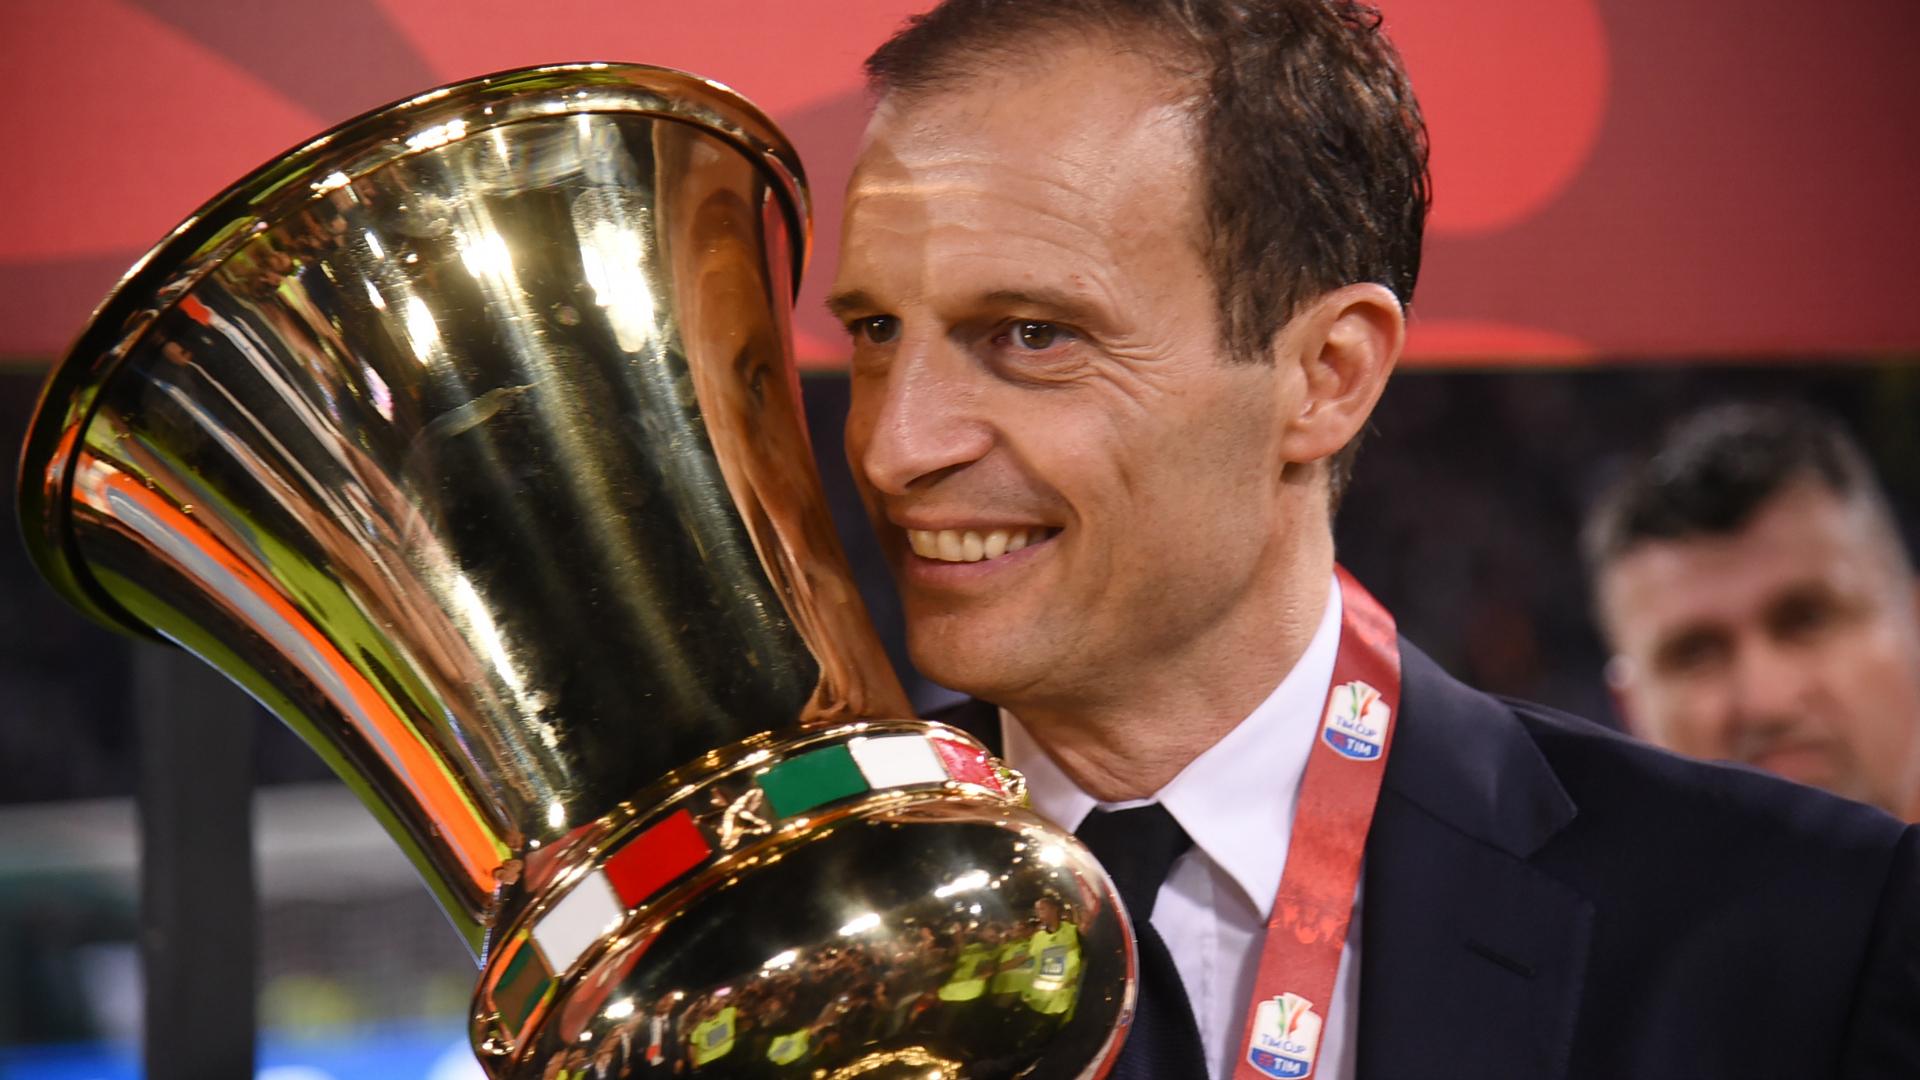 TIM Cup, venerdì l'Inter conoscerà il suo